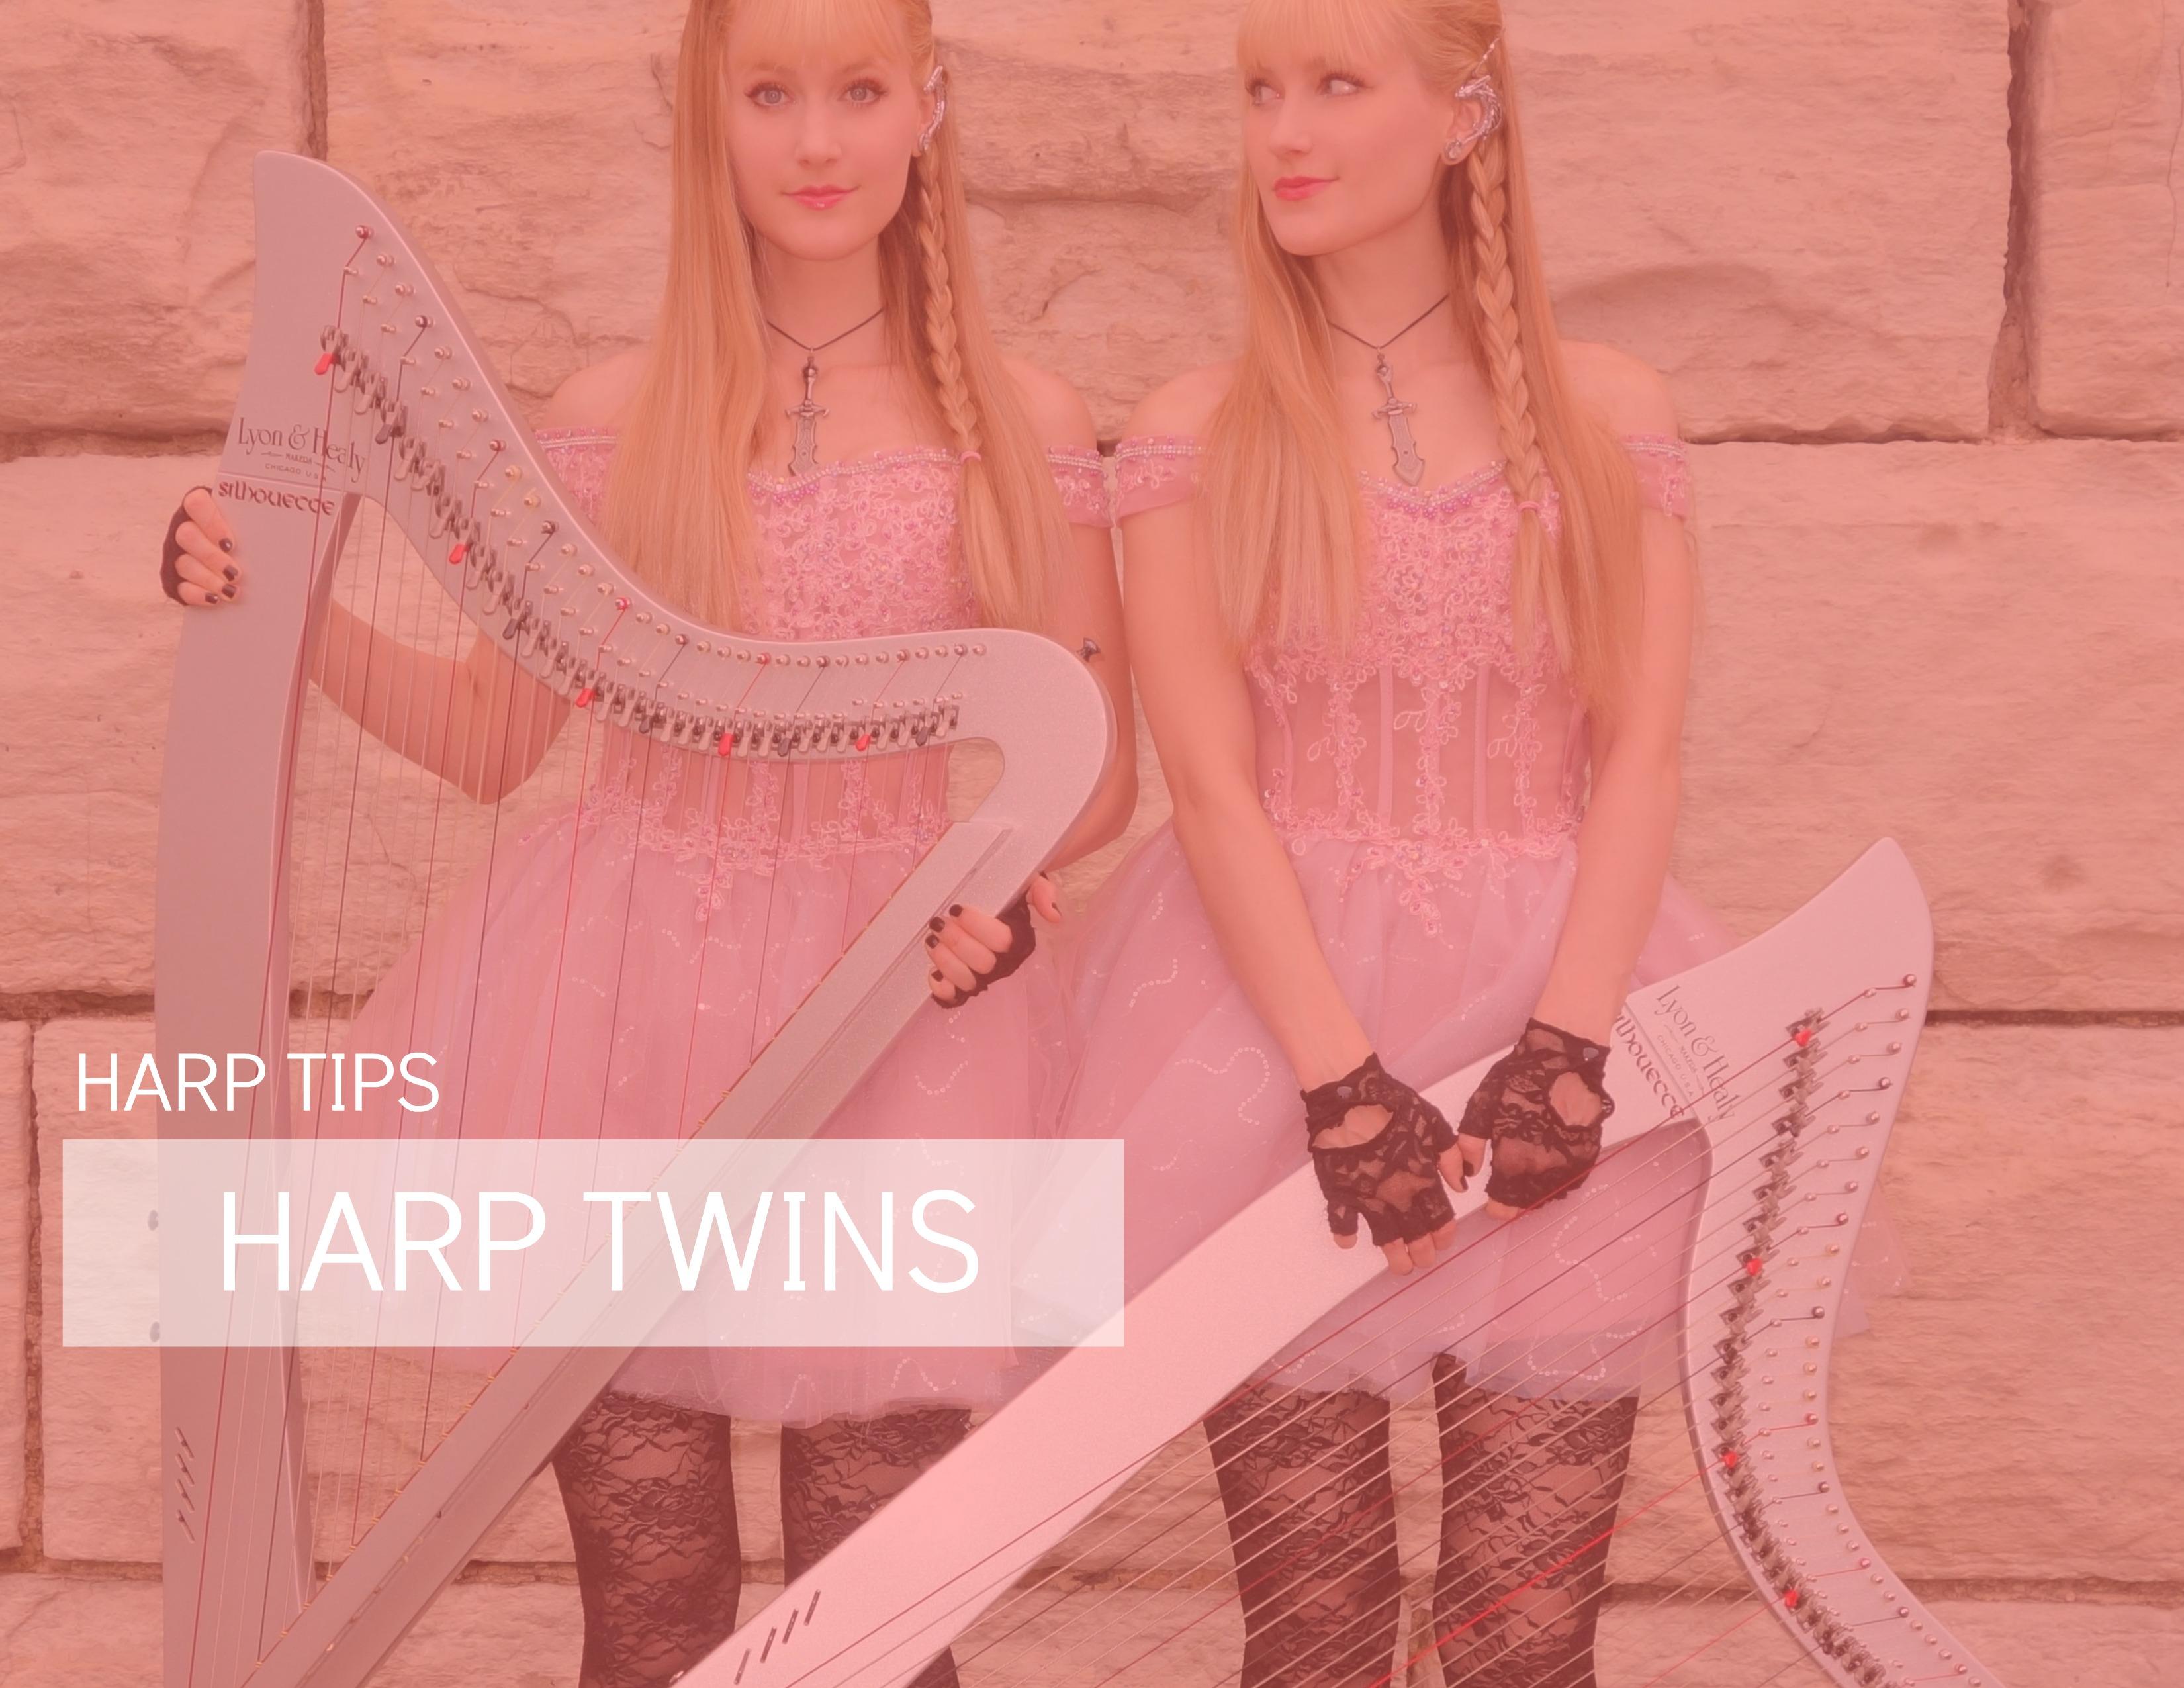 harp twins tips